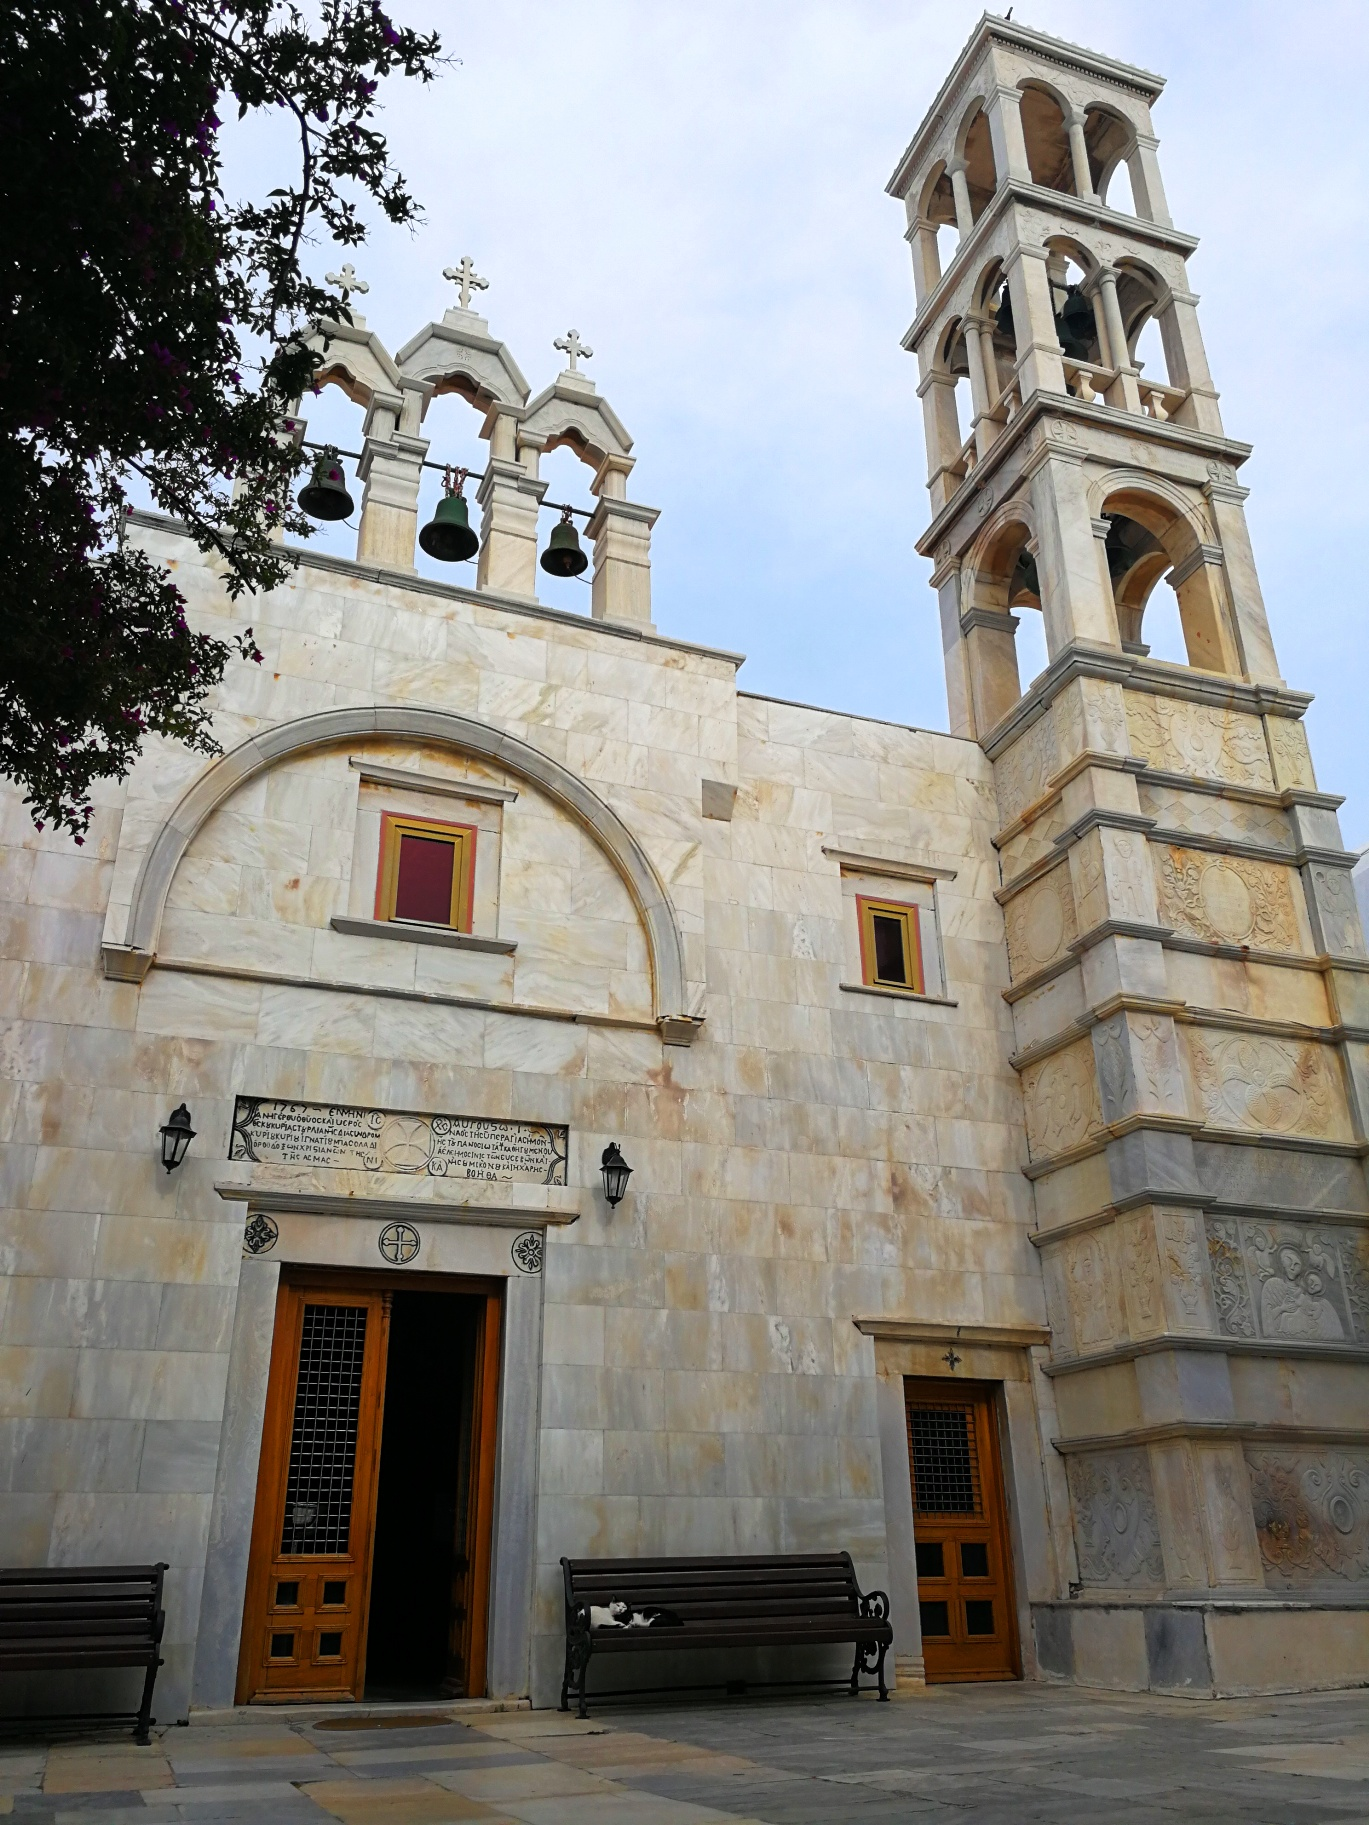 Mykonos - Monastery of Panagia Tourliani